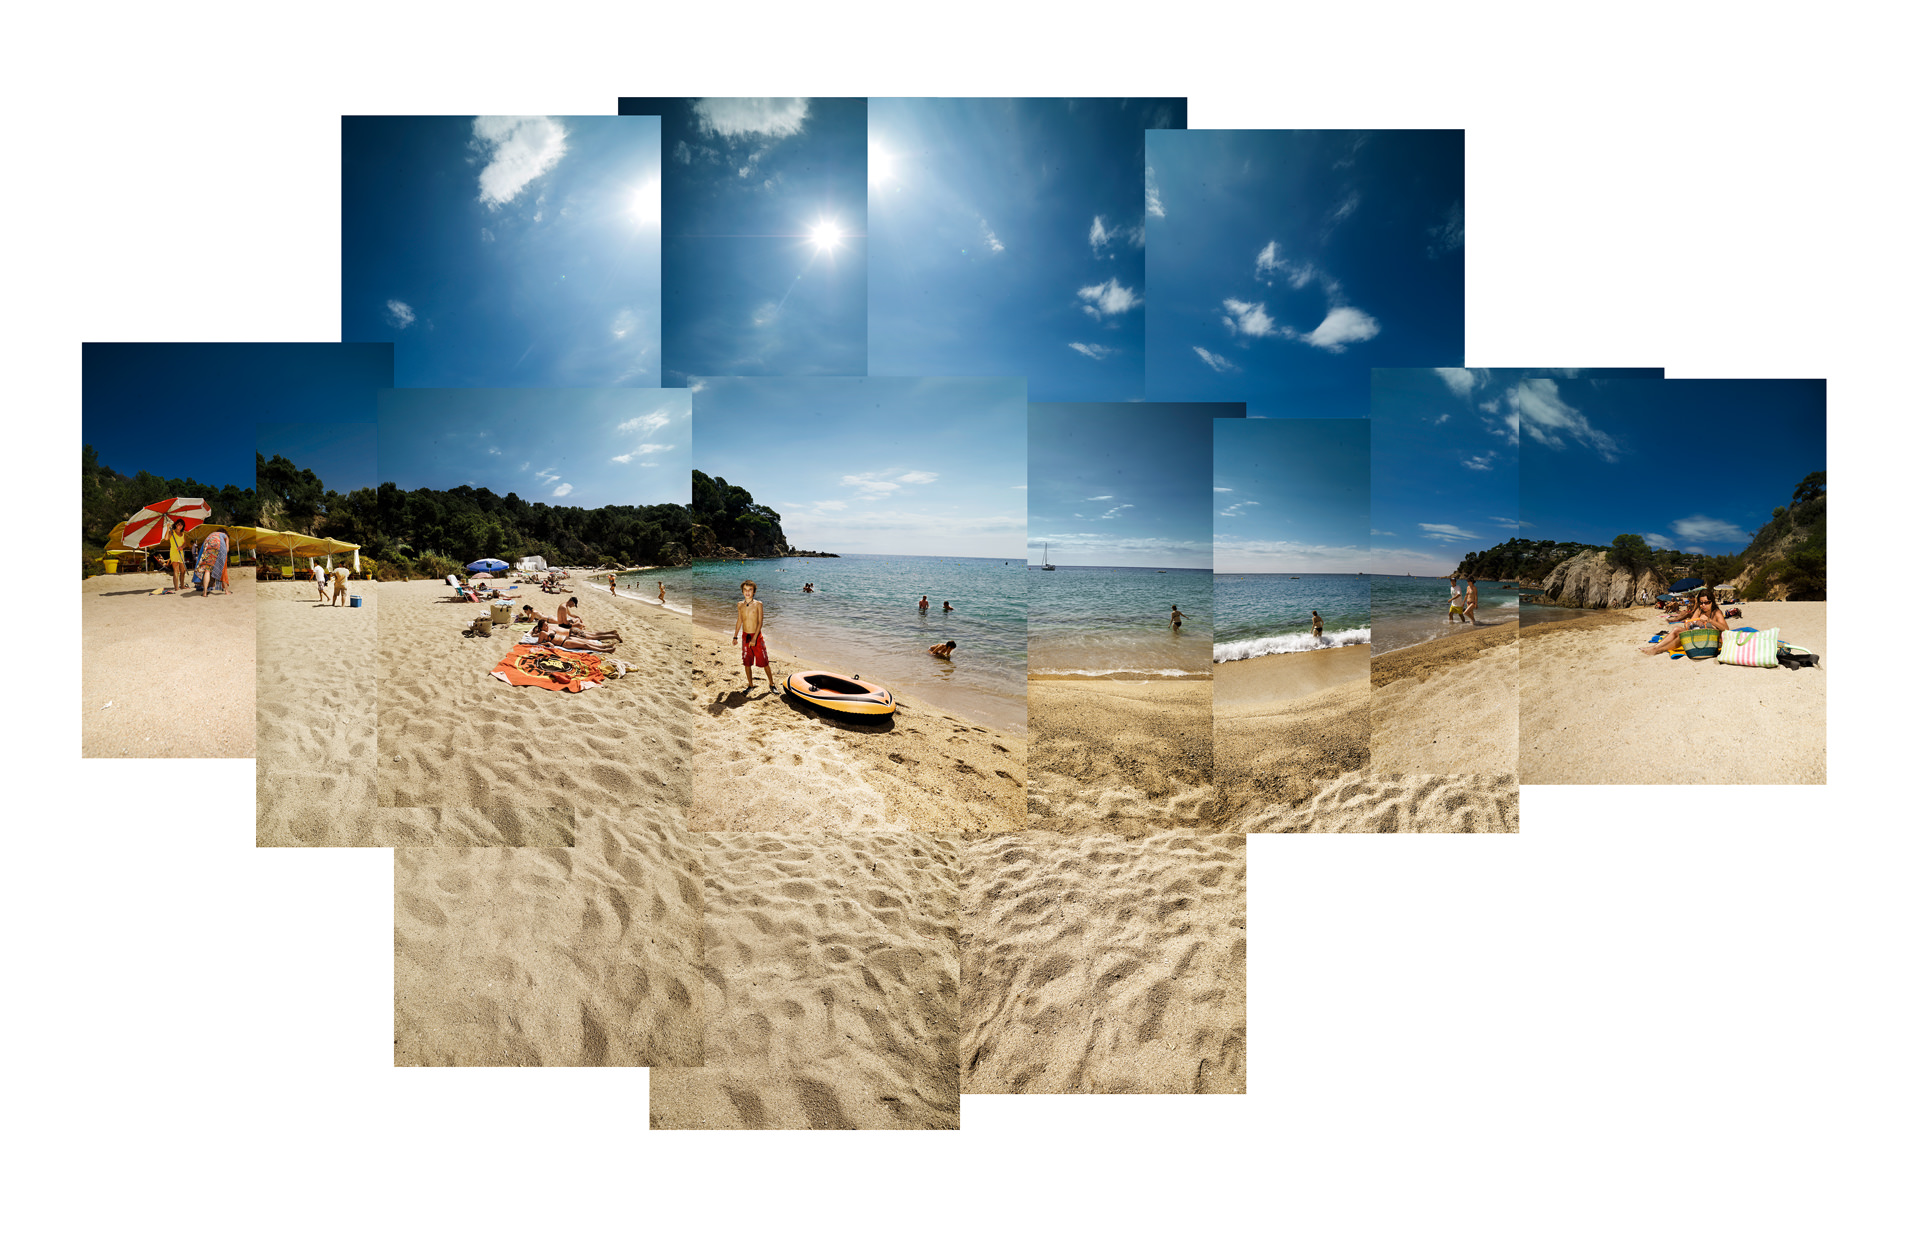 ©ankeluckmann639, ADAC, Reisemagazin, beach, spain, costa brava, people, landscape